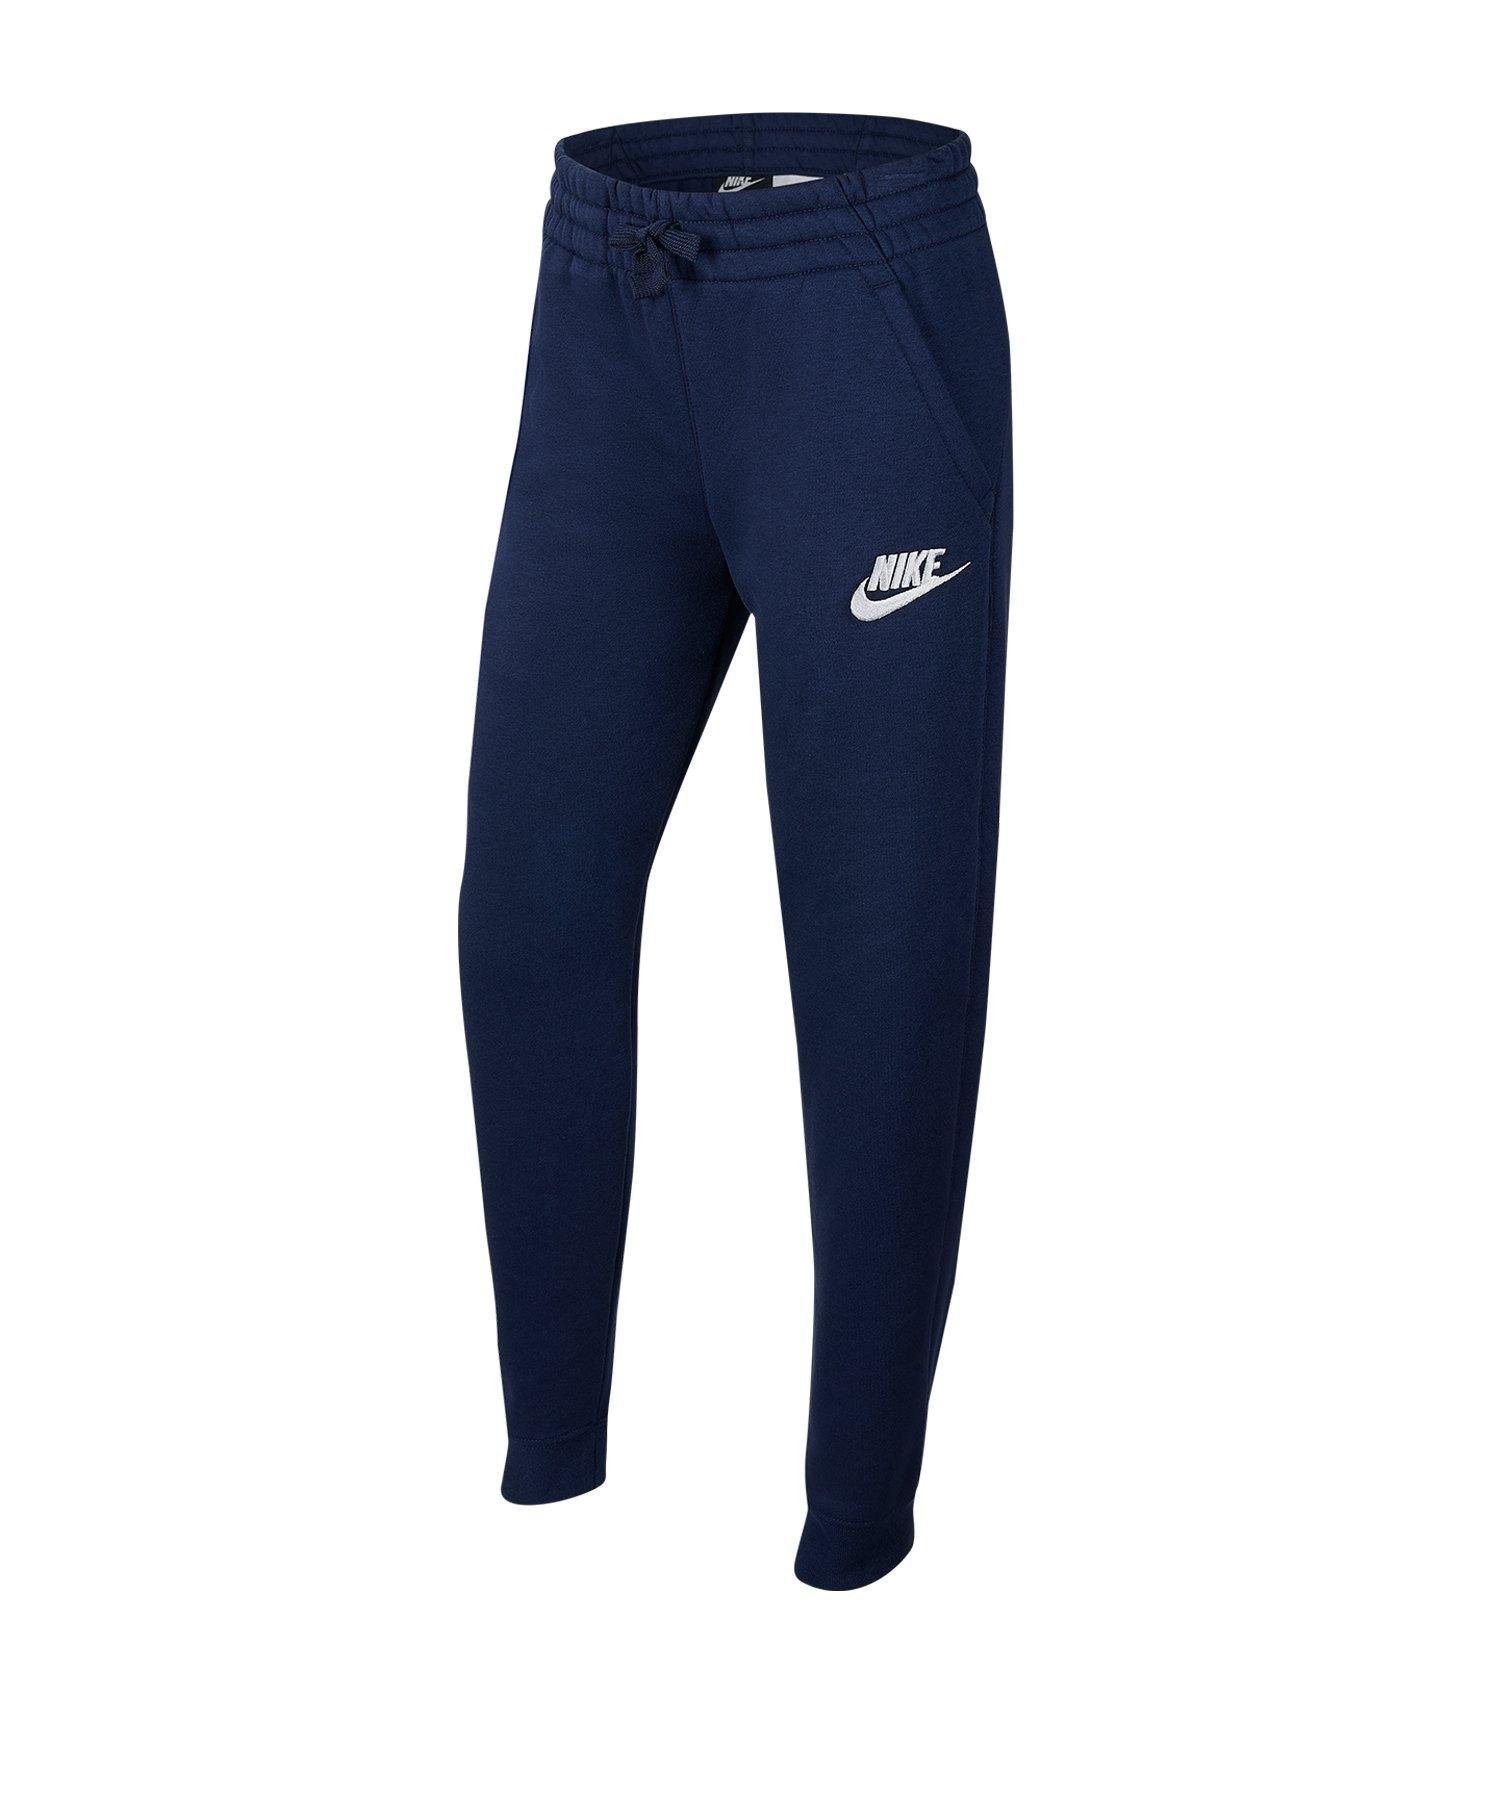 Nike Club Jogger Jogginghose Kids Blau F410 - blau